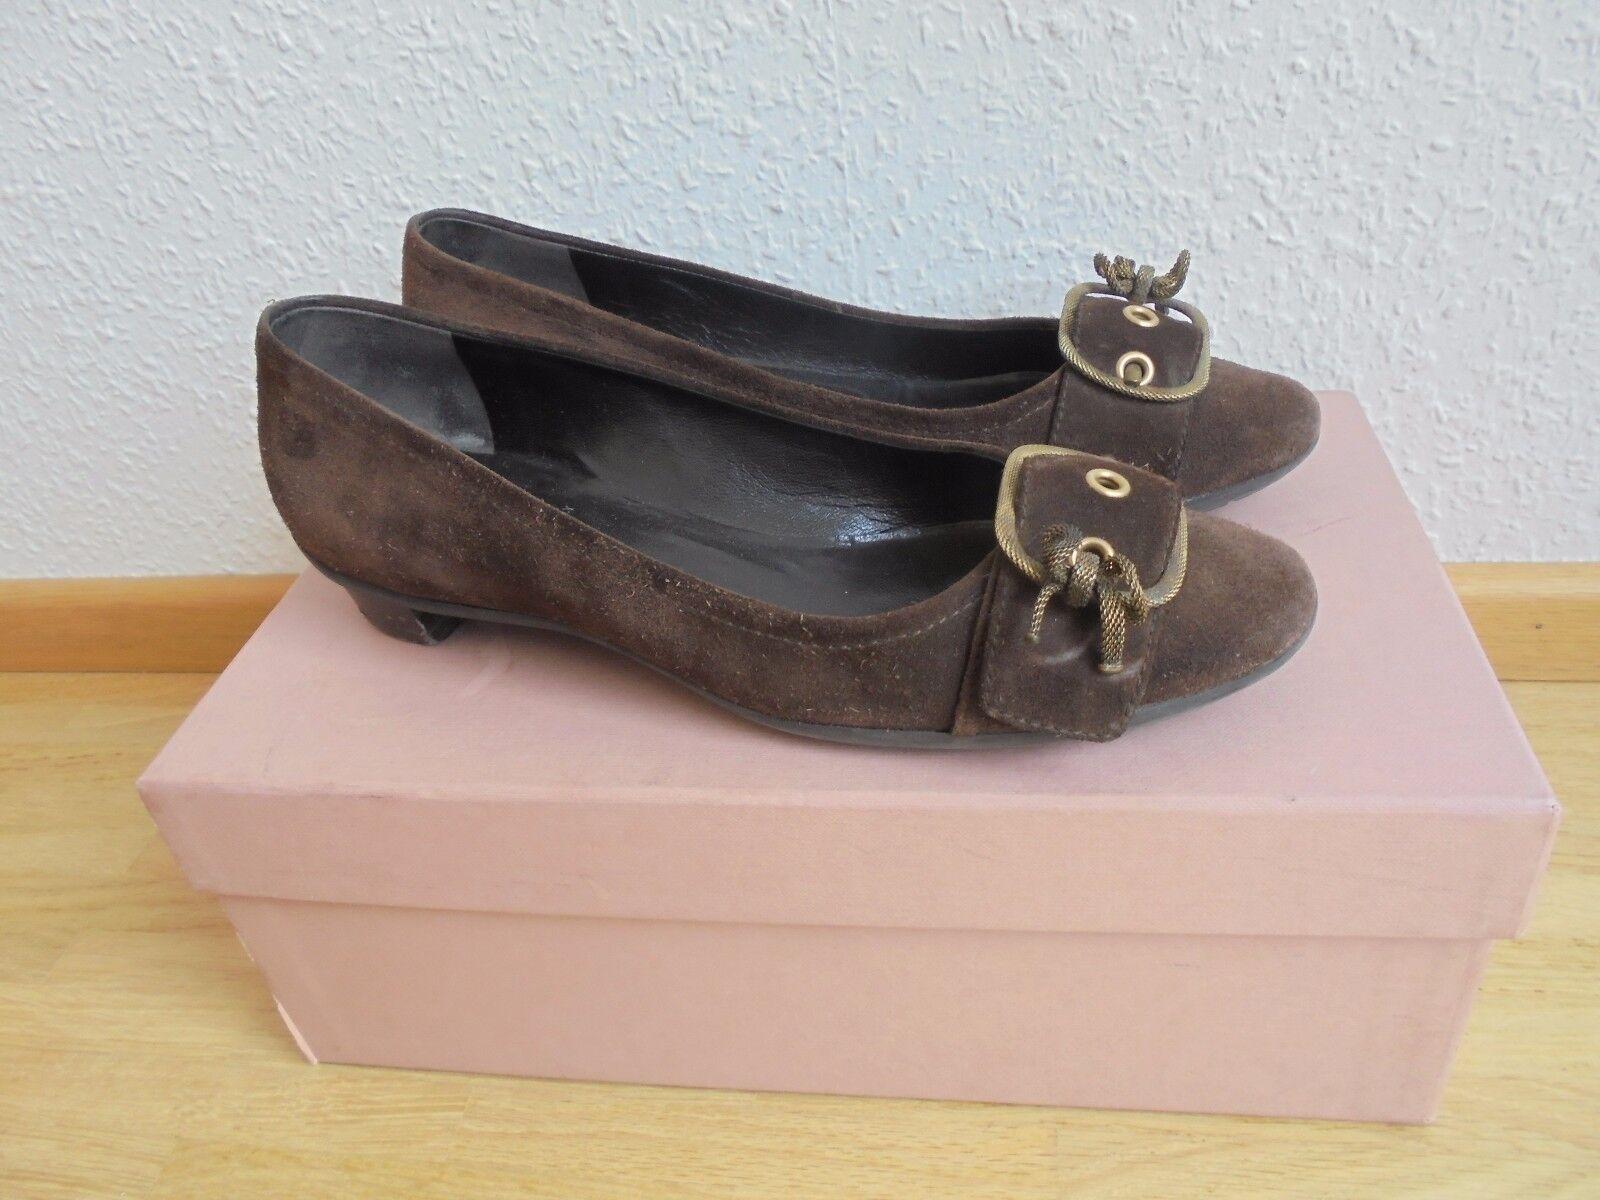 Miu Miu by Prada Wildleder Ballerinas NP:  Pumps Schuhe Gr. 36